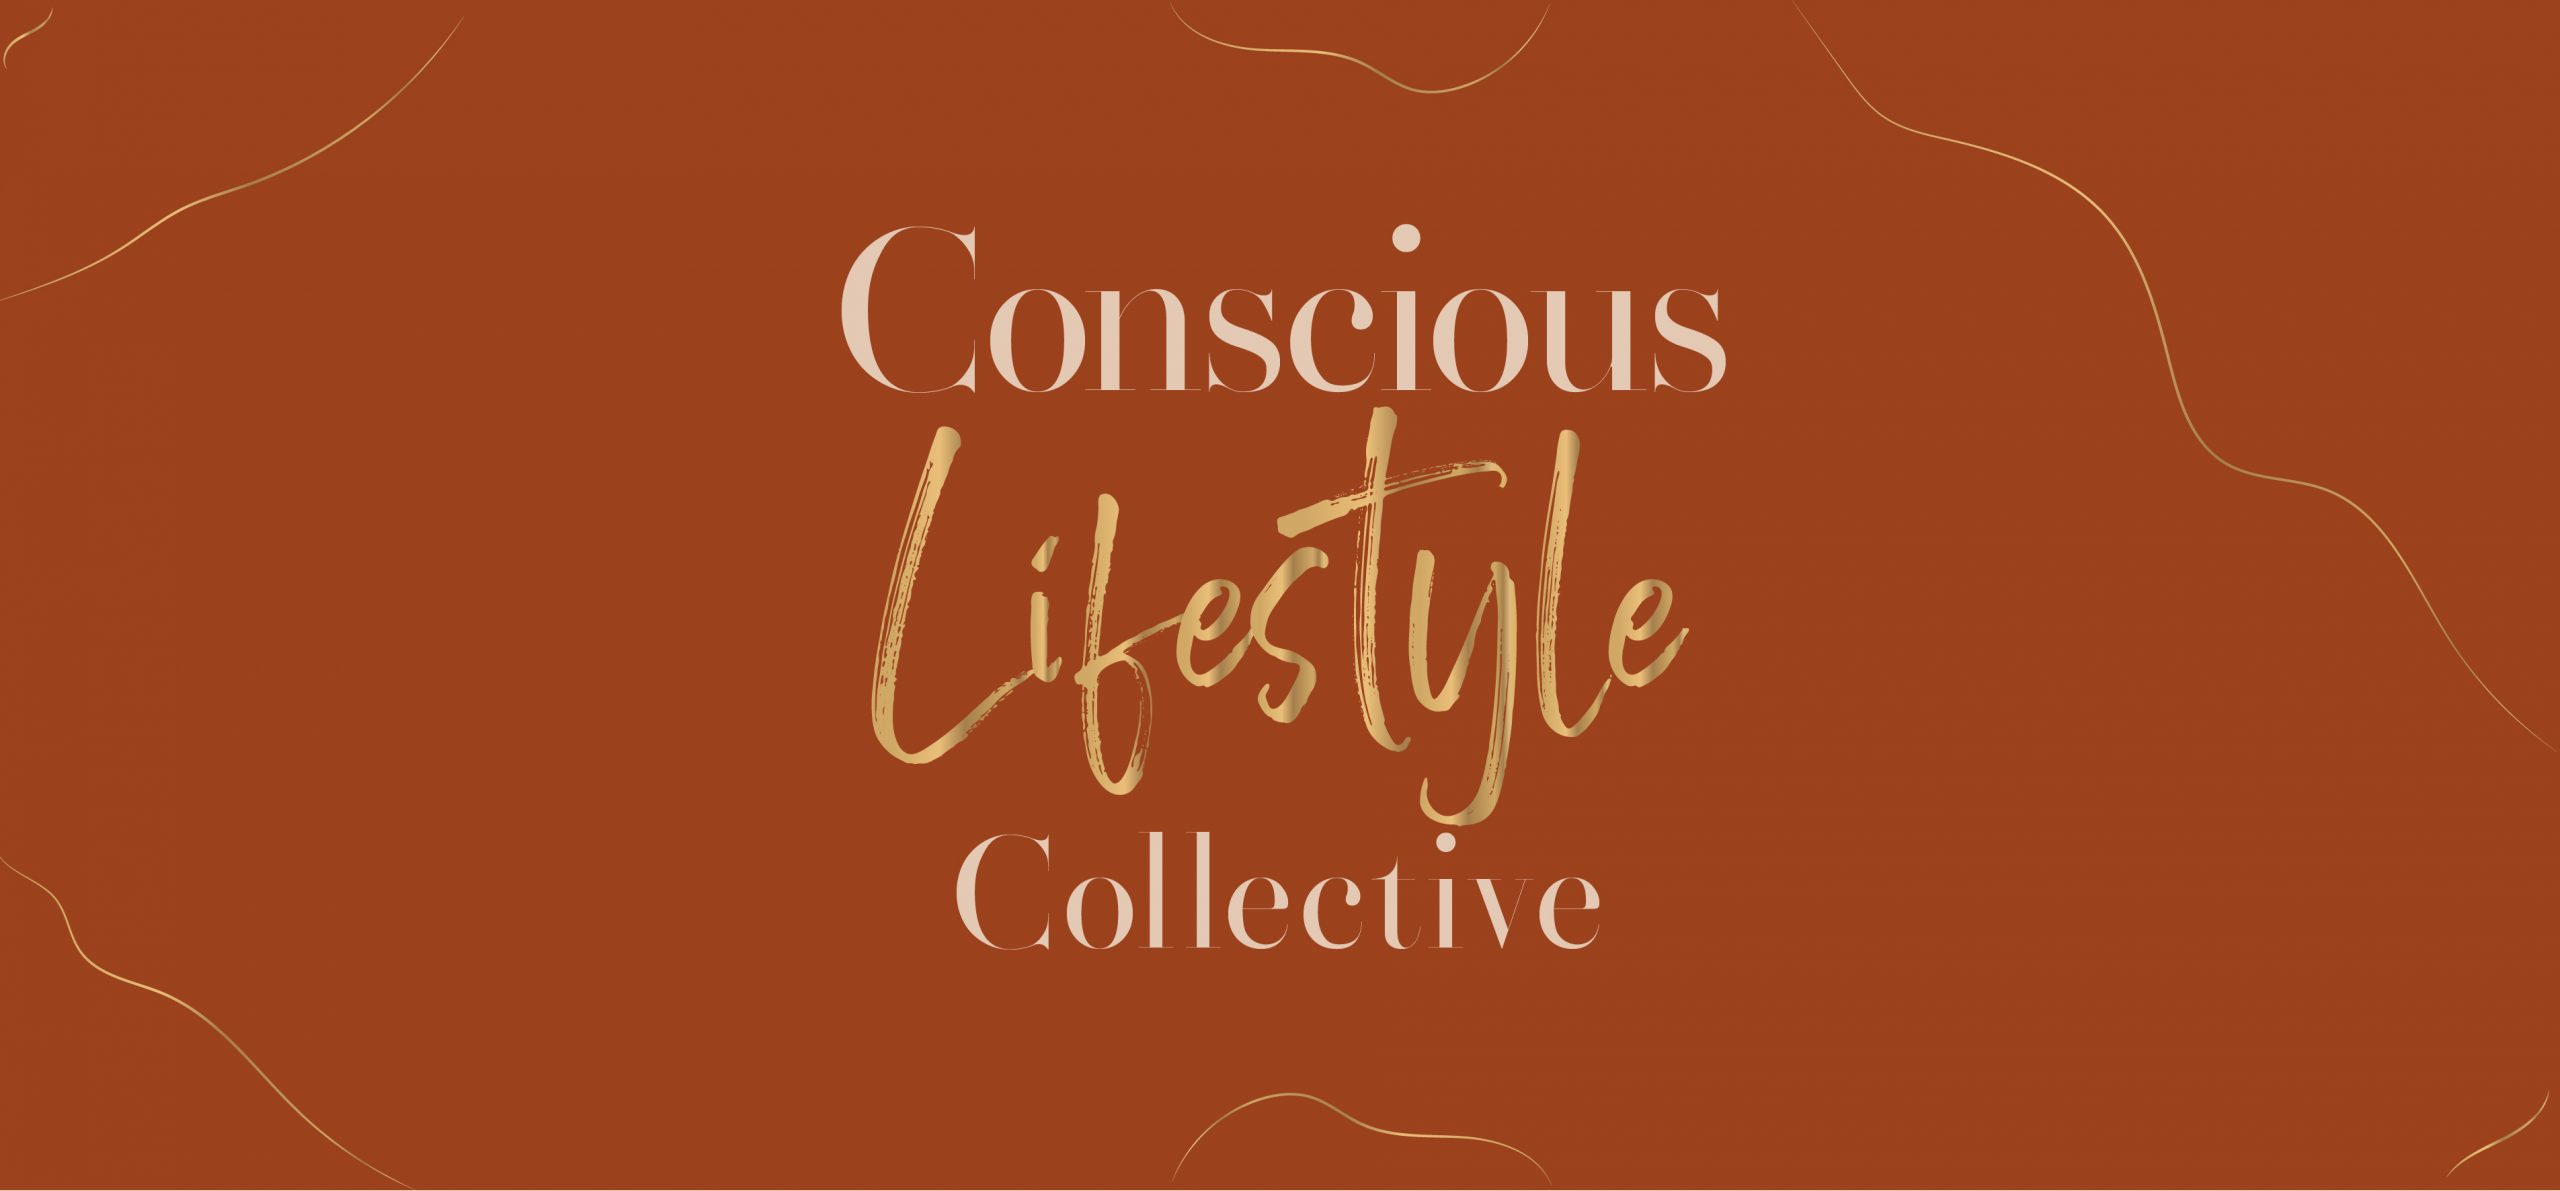 Conscious Lifestyle Collective